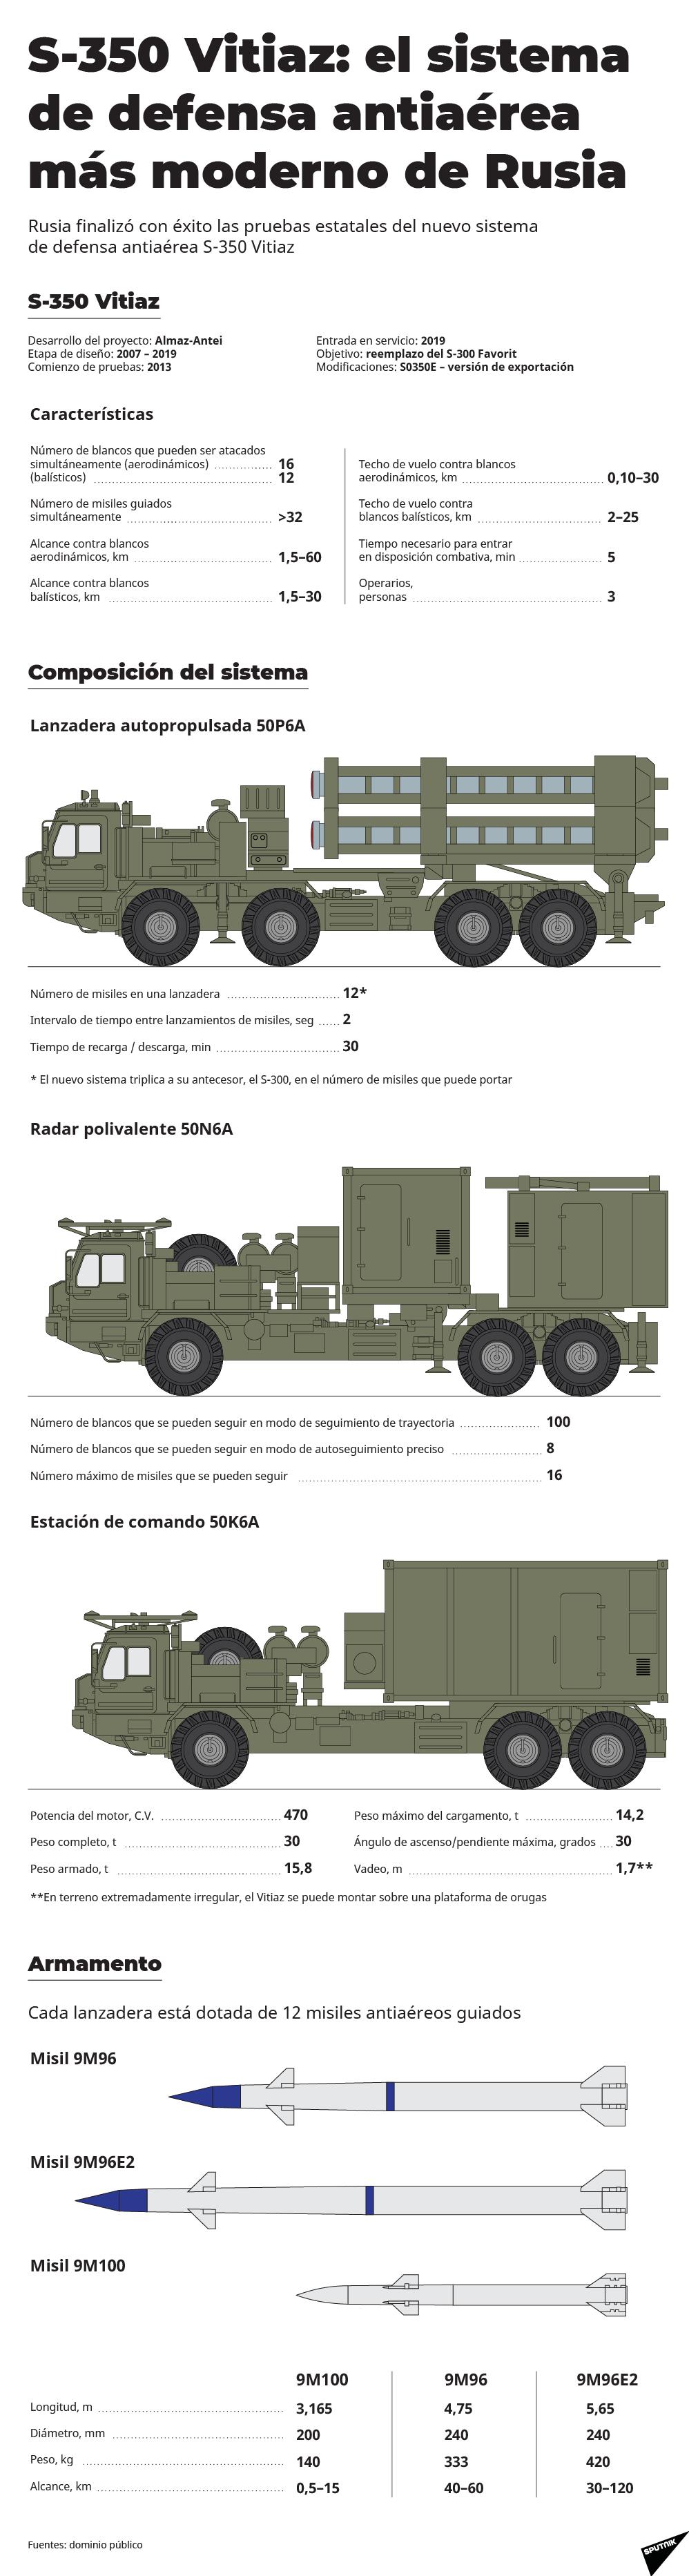 S-350 Vitiaz, el 'guardián' de los cielos rusos - Sputnik Mundo